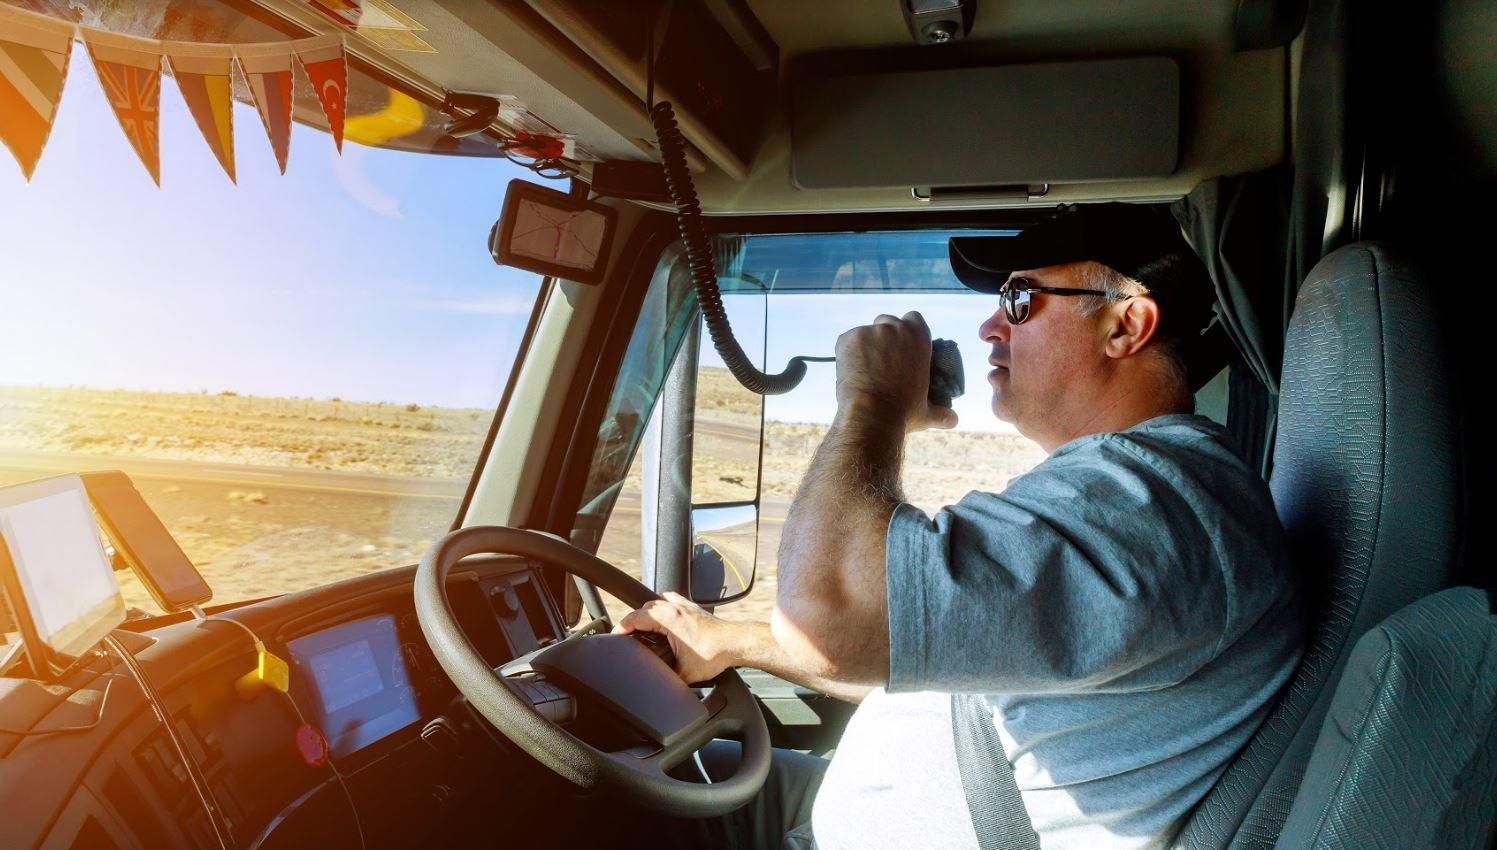 Truck driver driving on Austrlian highway.